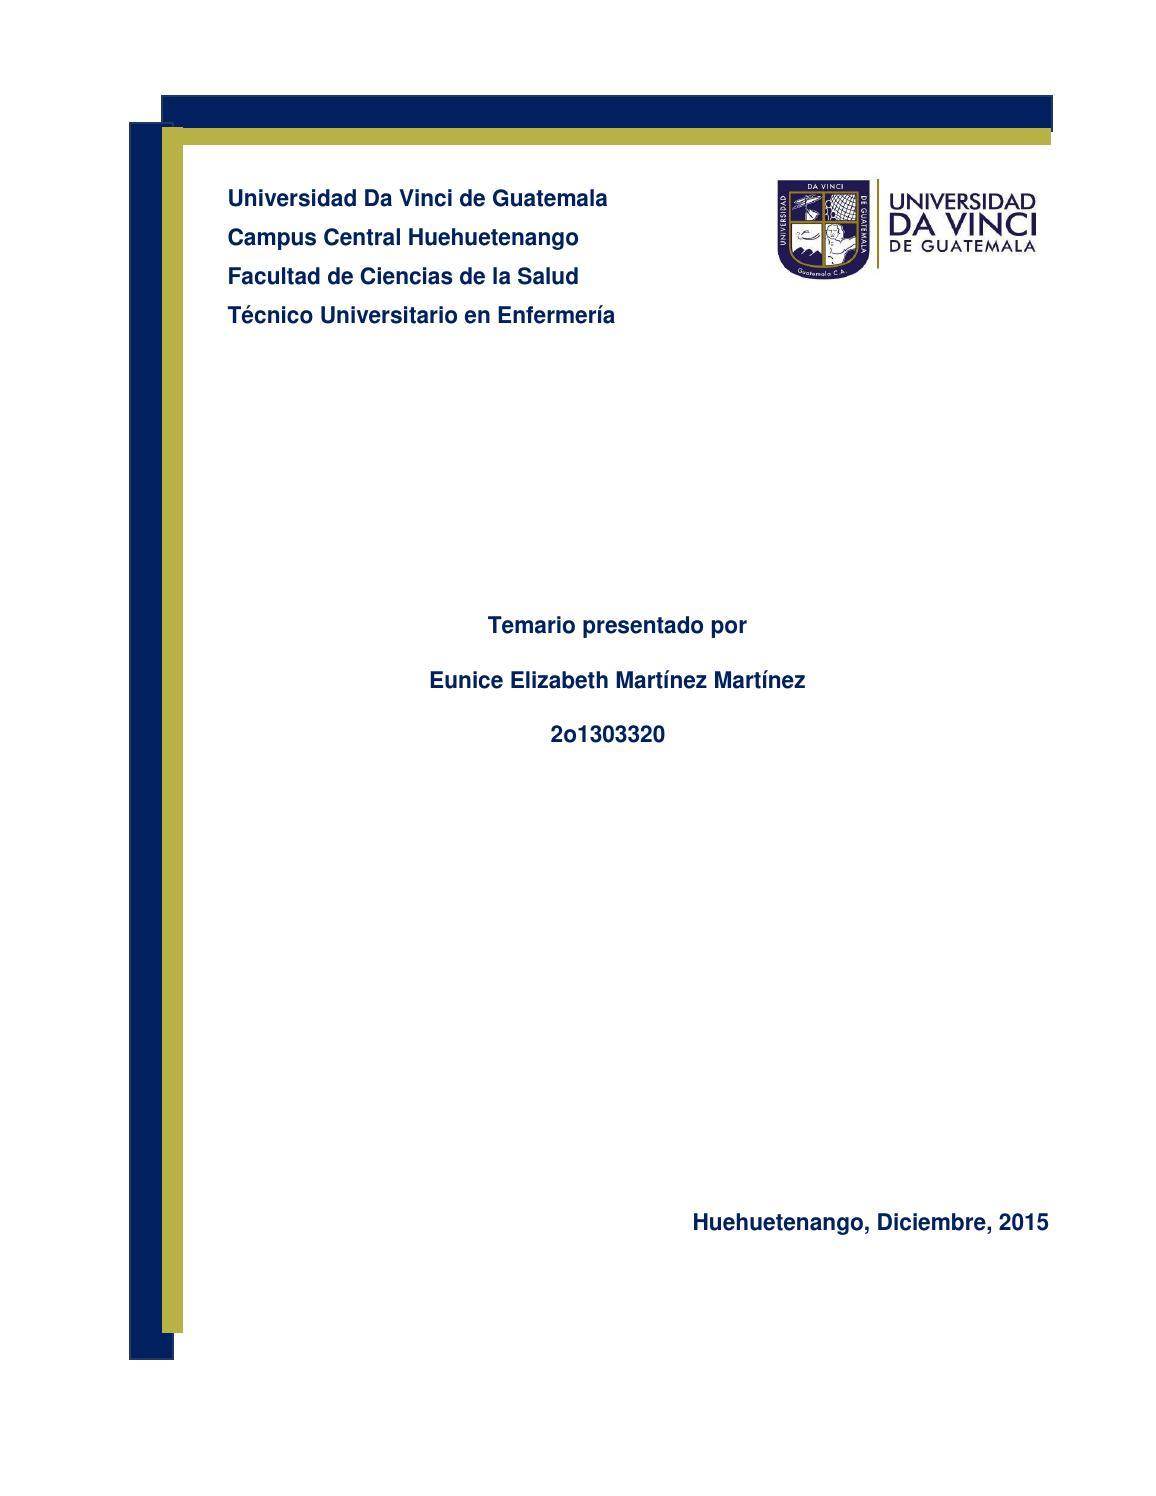 Temario eunice martinez 2013 03 320 by Edvin Morales - issuu